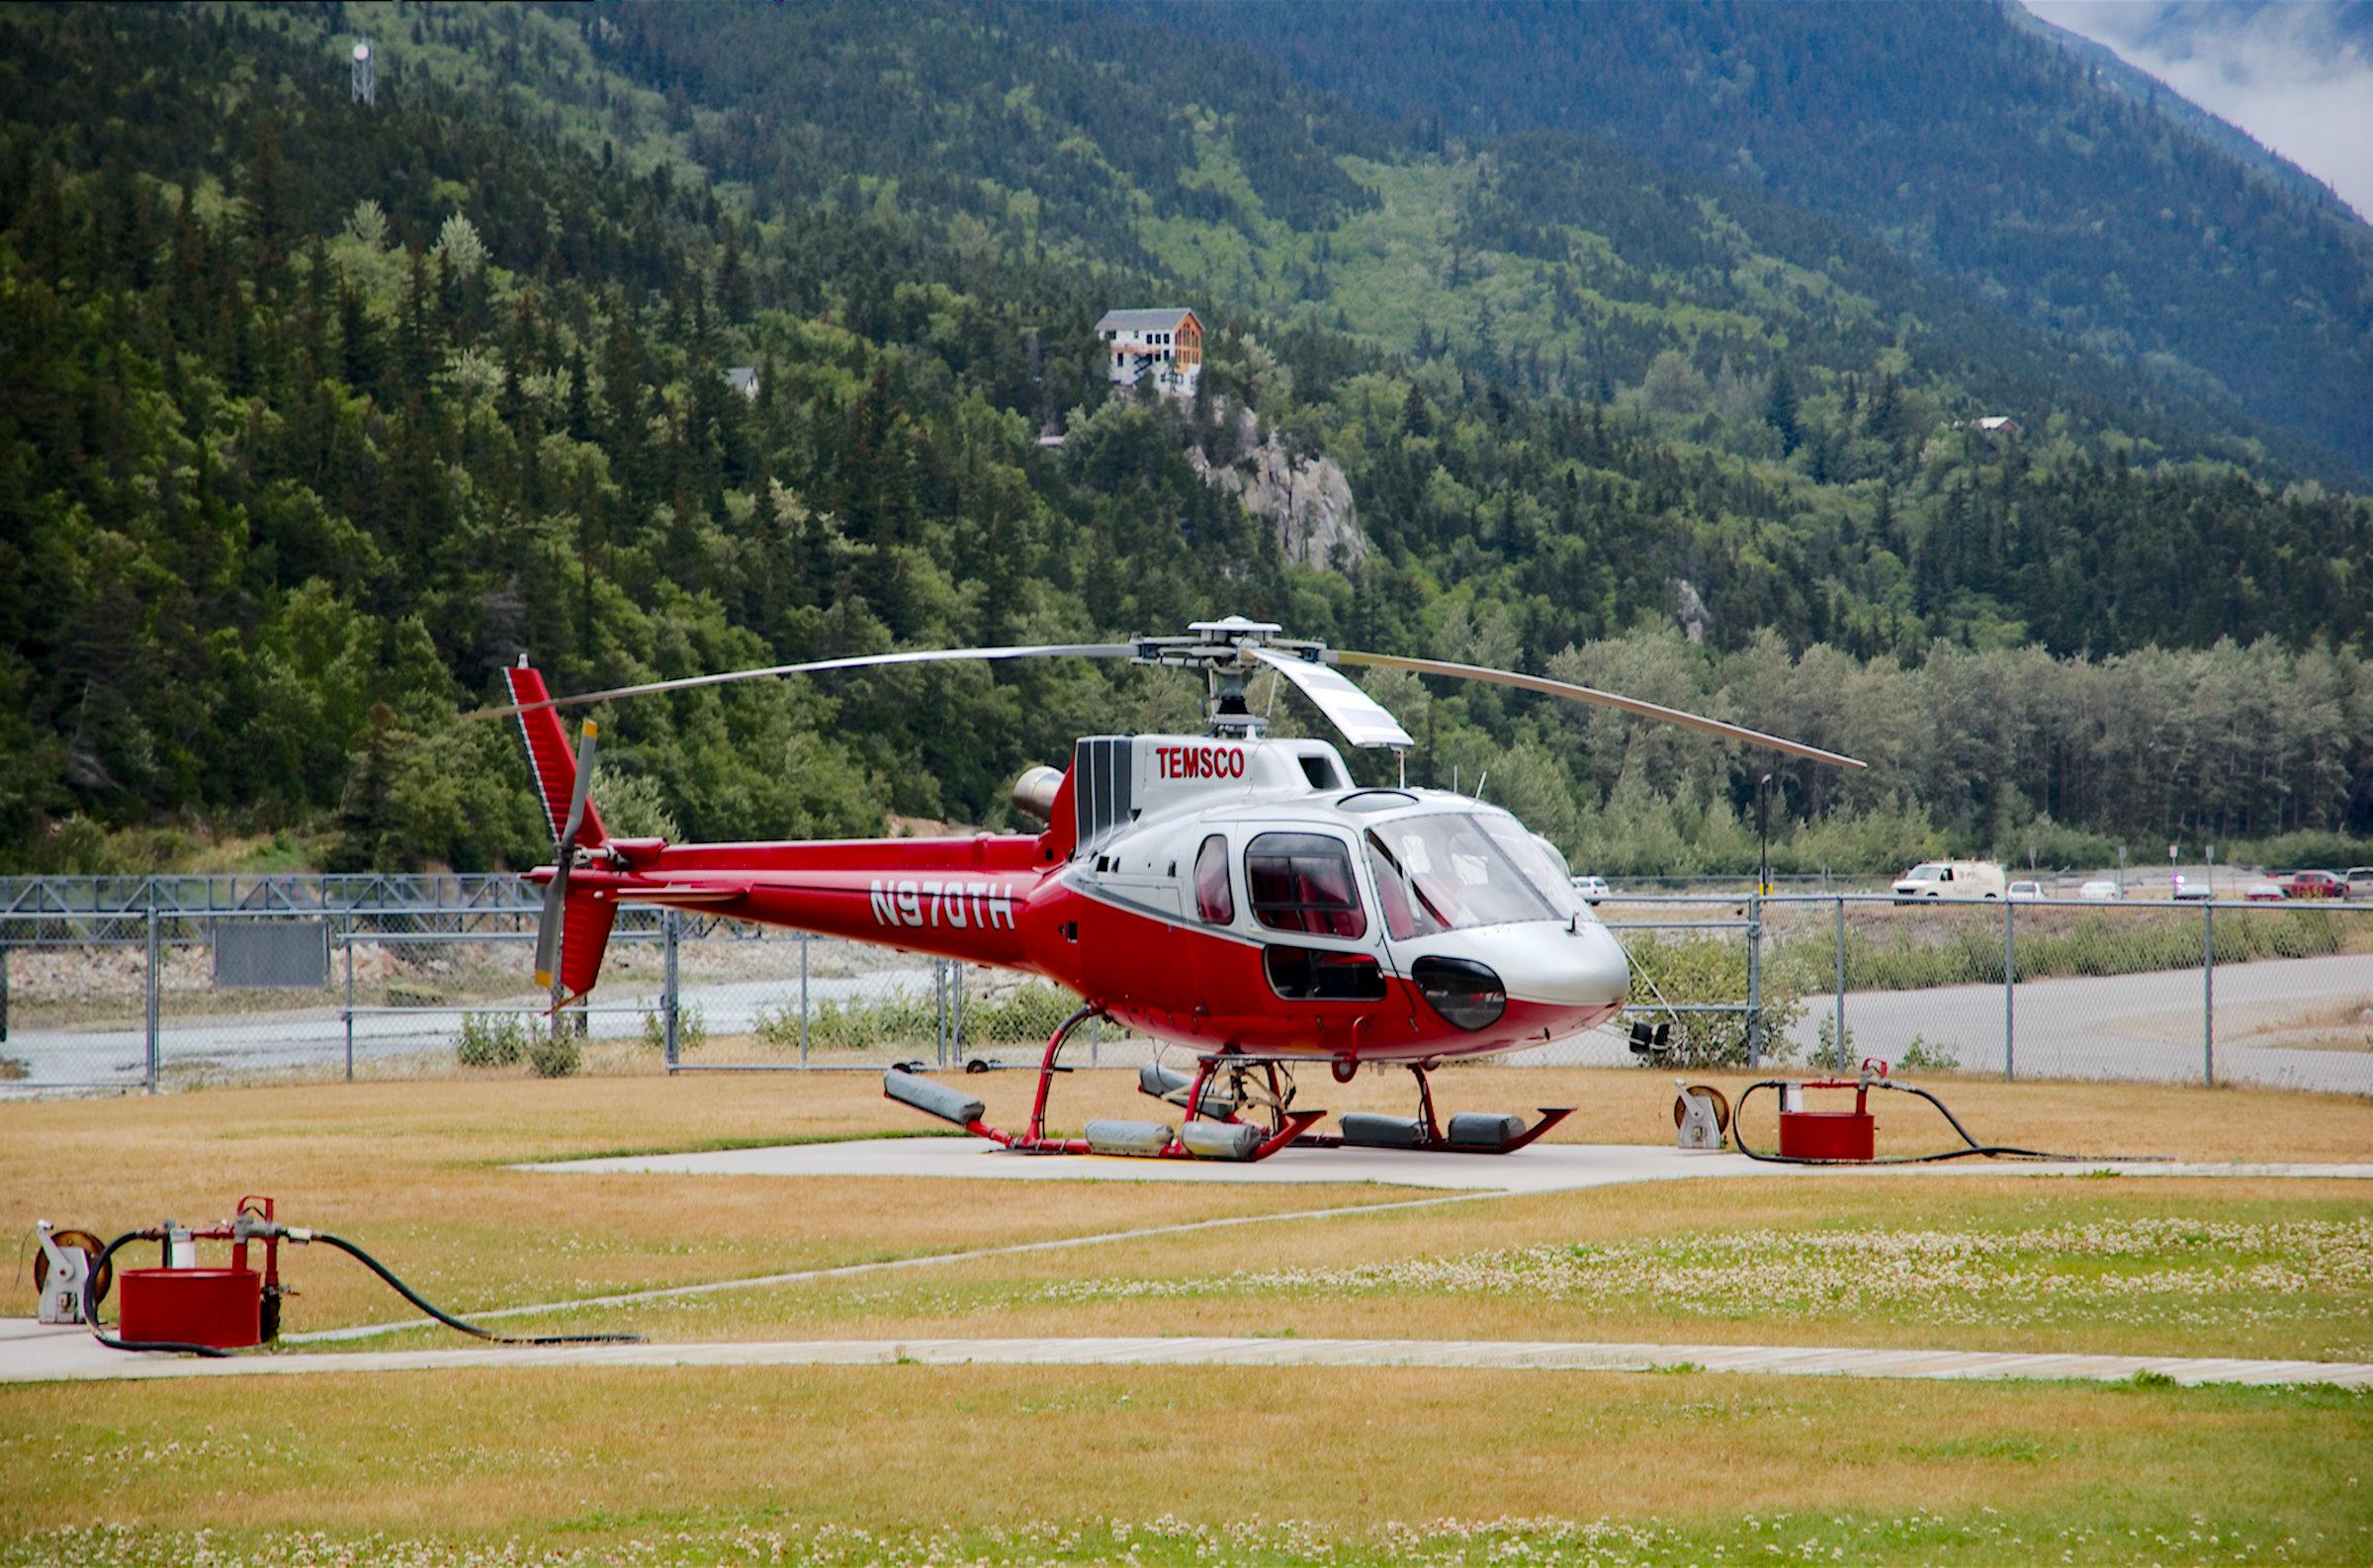 Temsco Helicopter Tours